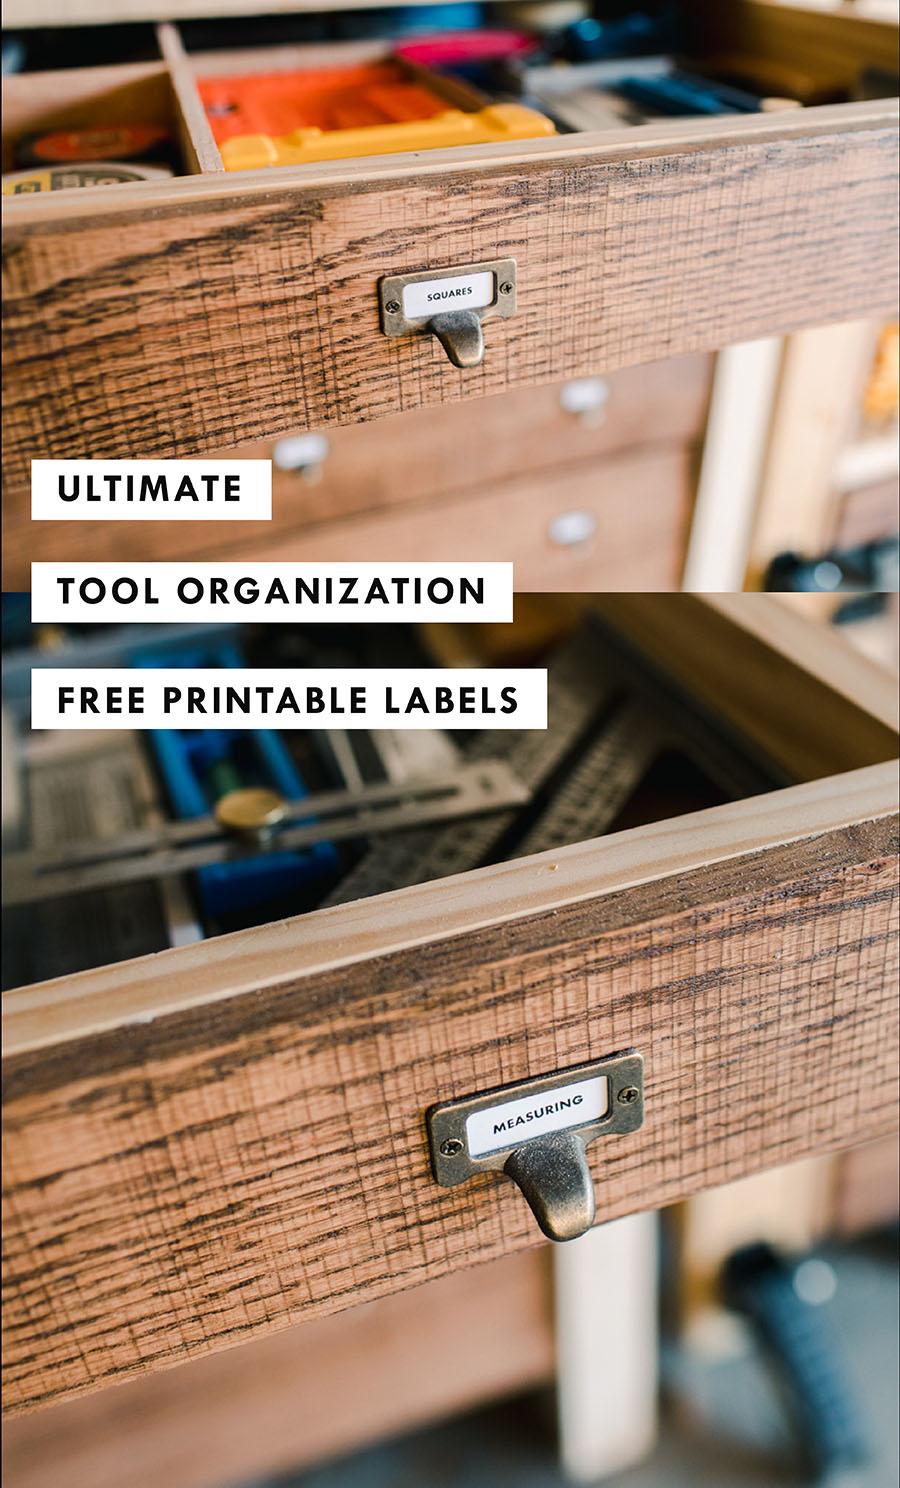 Miter Station Drawers Free Labels for Tools Workshop